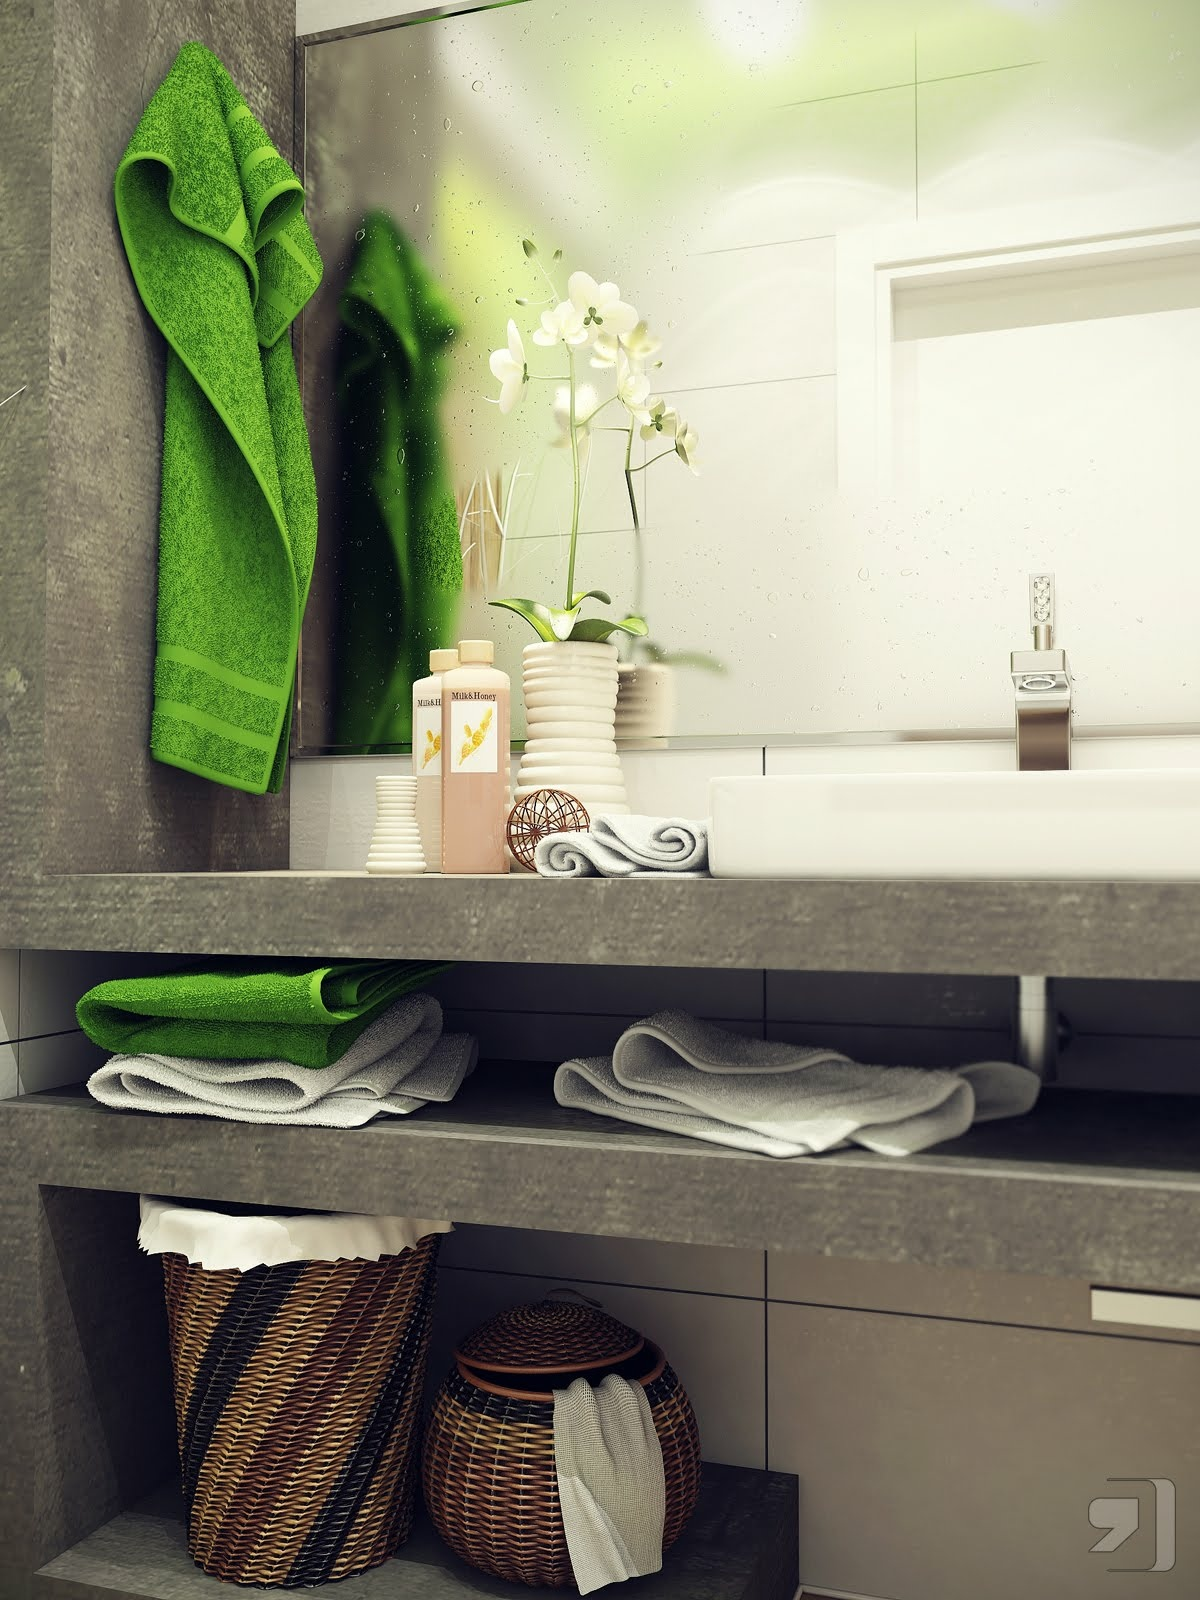 Small Bathroom Design on Small Space:t5Ts6Ke0384= Small Bathroom Ideas  id=96777